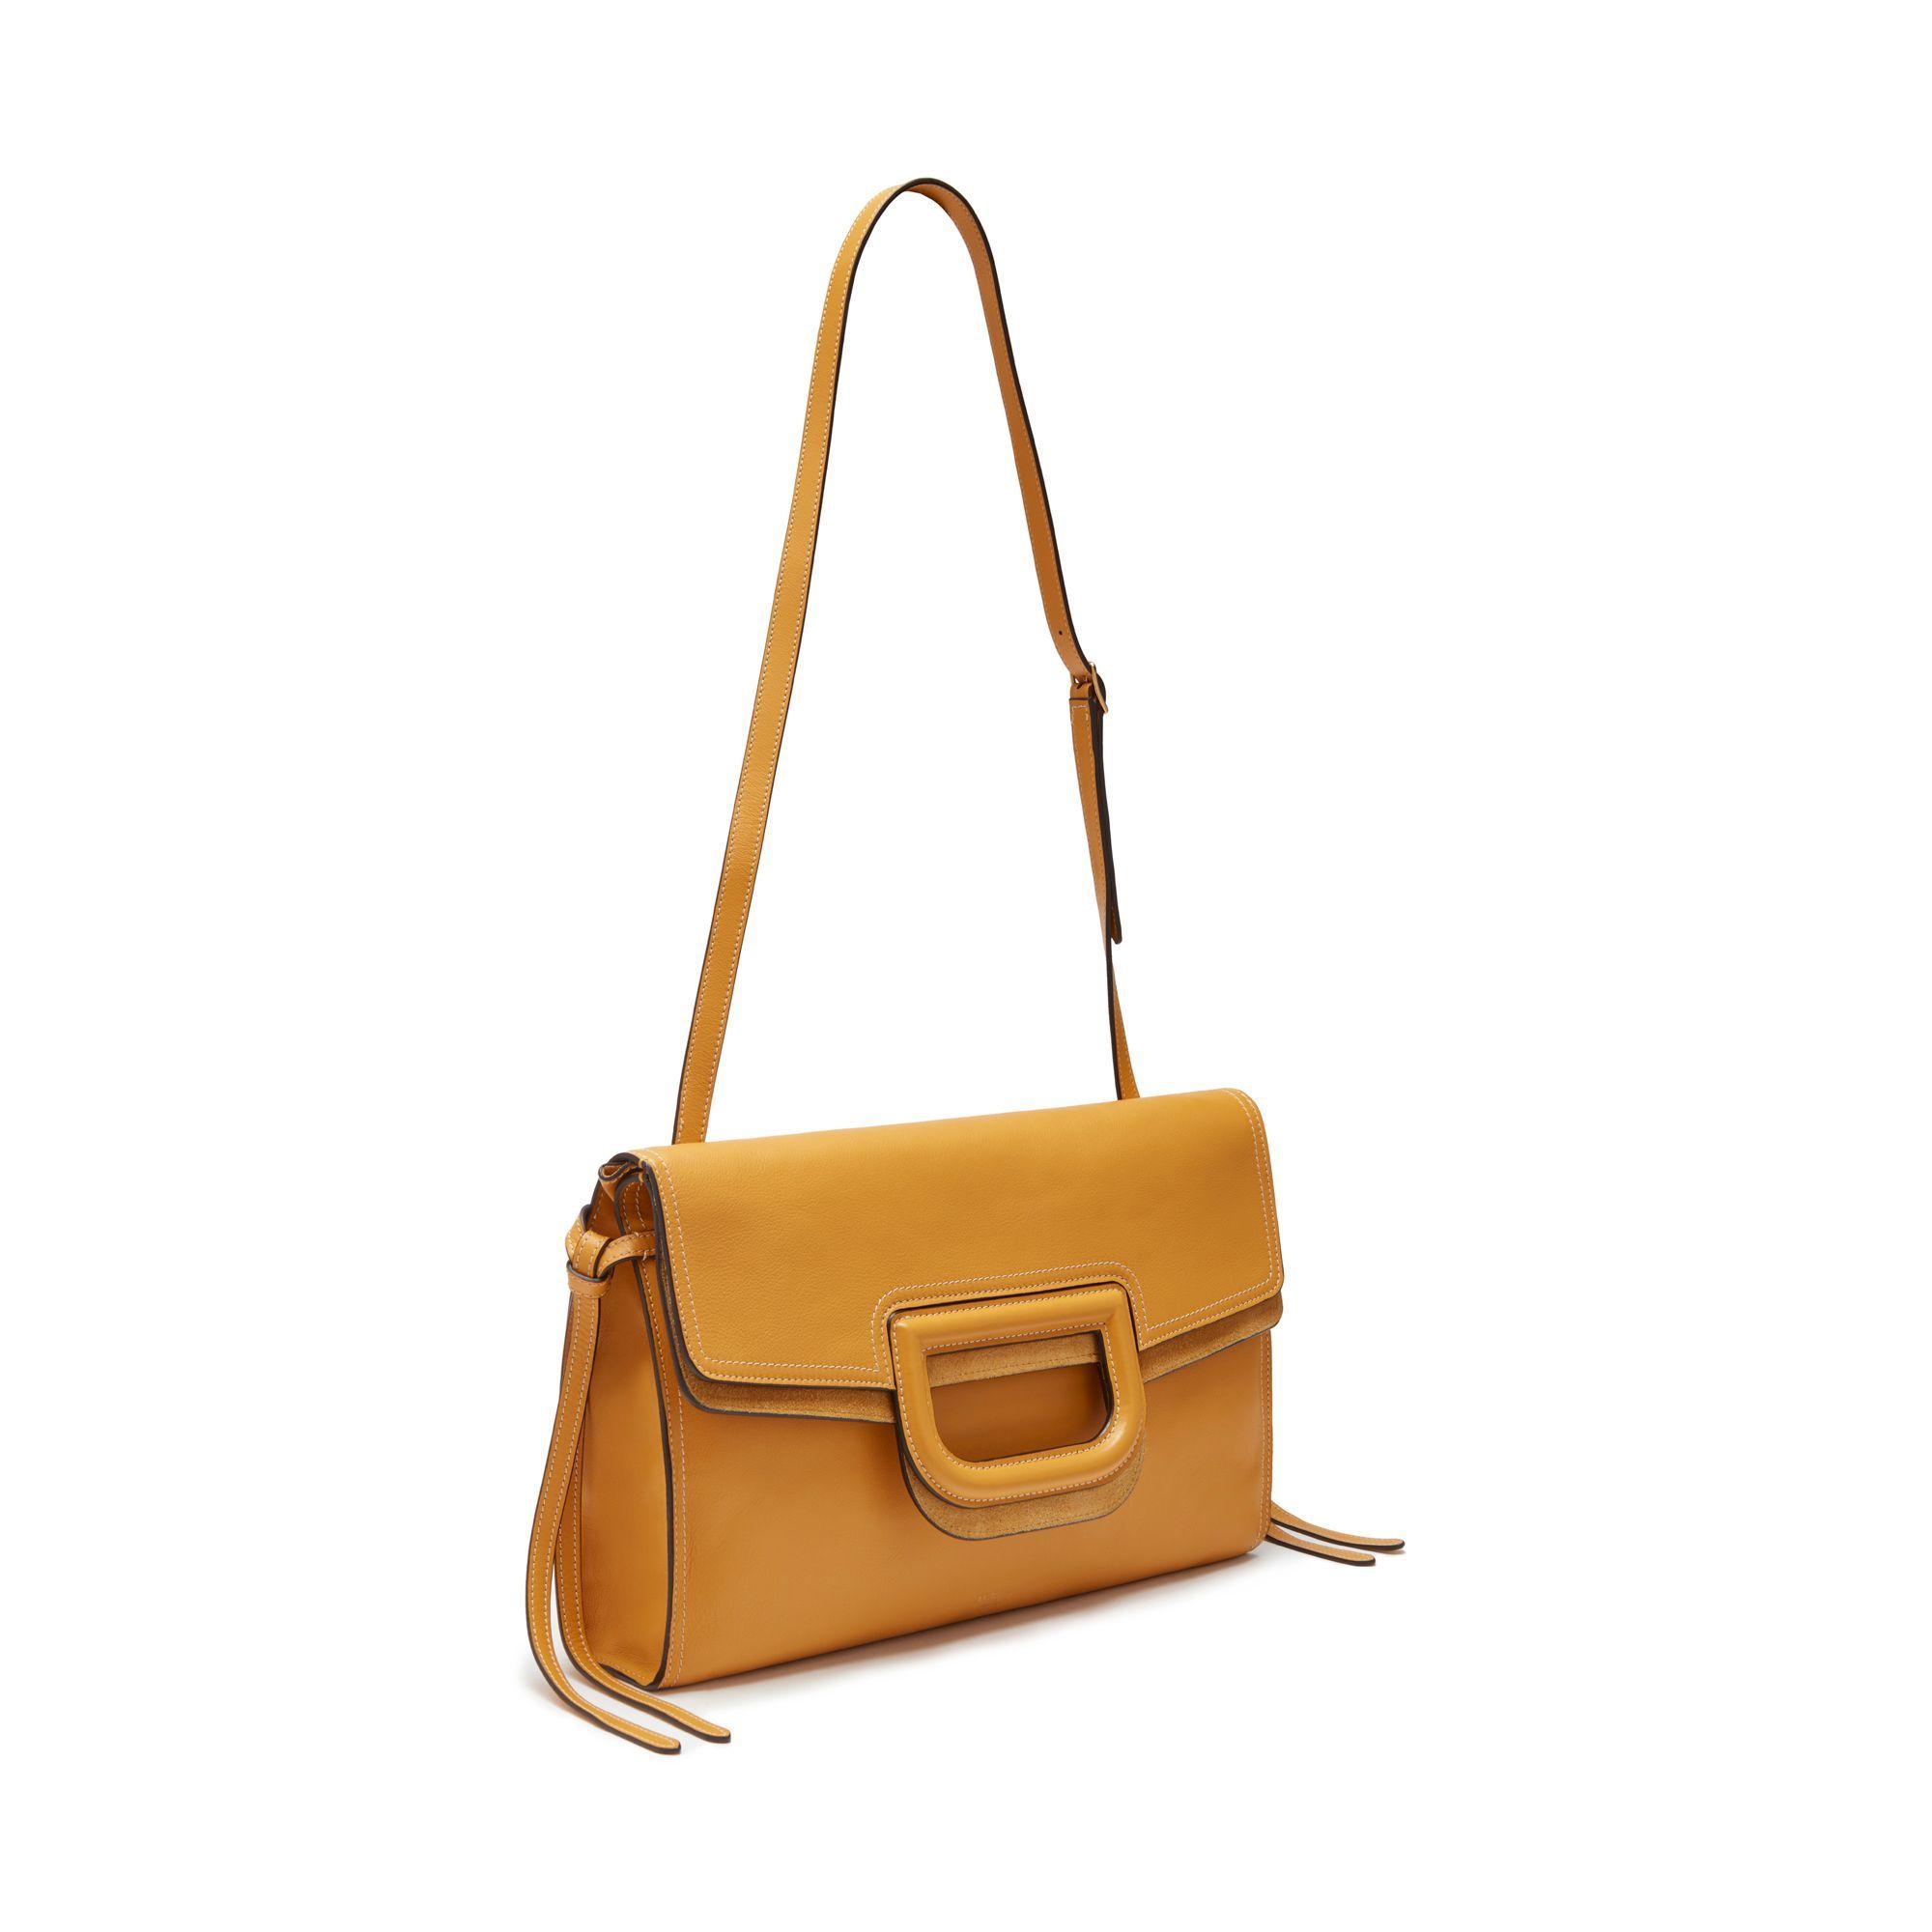 d233b647c48 ... order tote bag brimley envelope gold ochre silky calf brimley mulberry  fc3f4 0a973